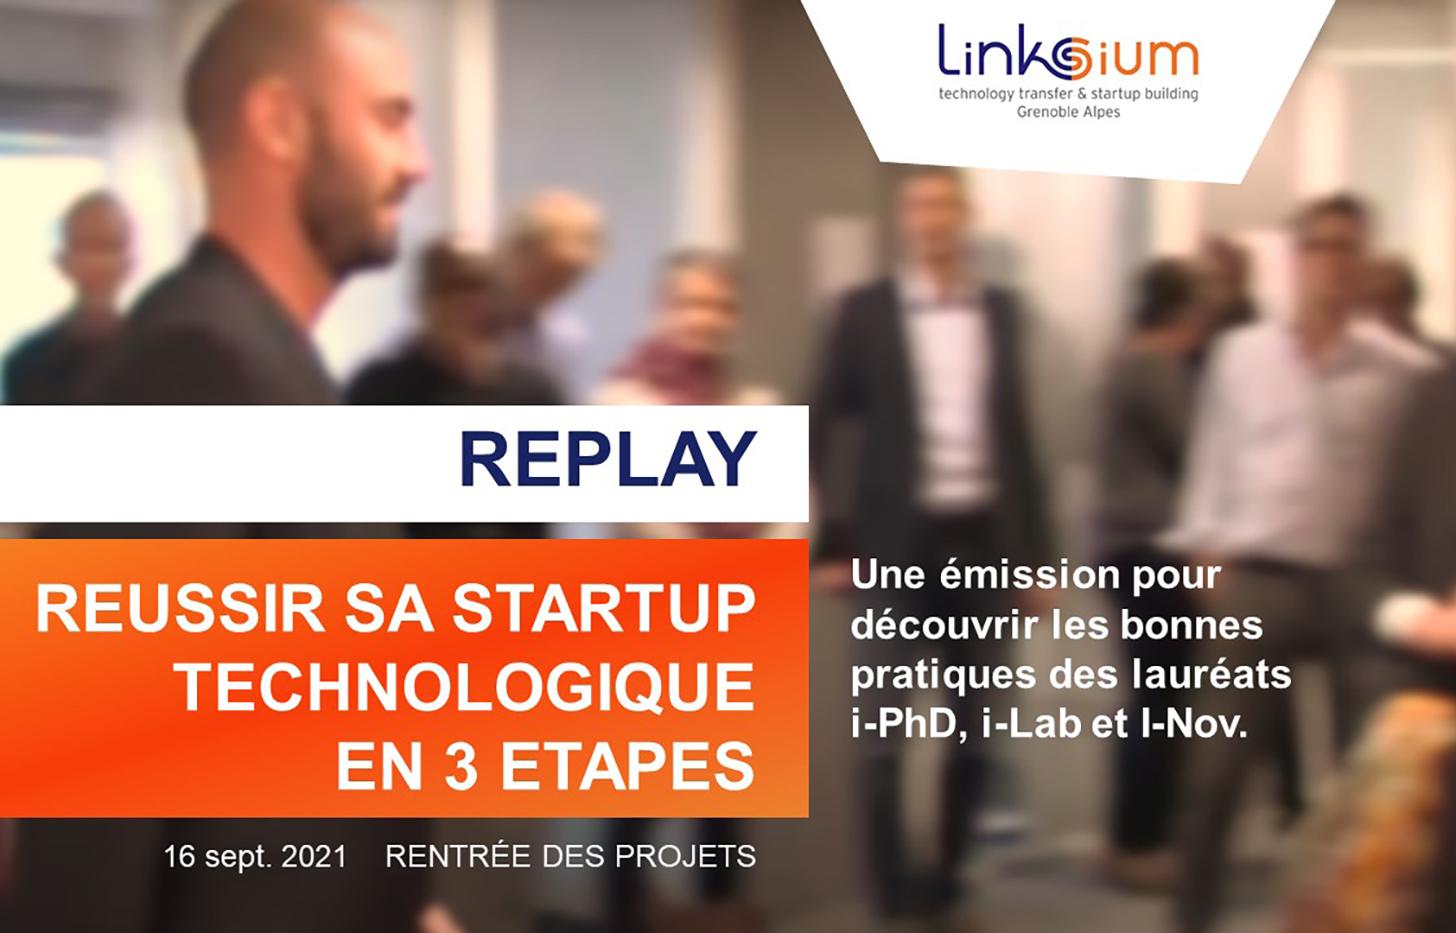 REPLAY Réussir sa startup technologique en 3 étapes Linksium SATT Grenobel Alpes